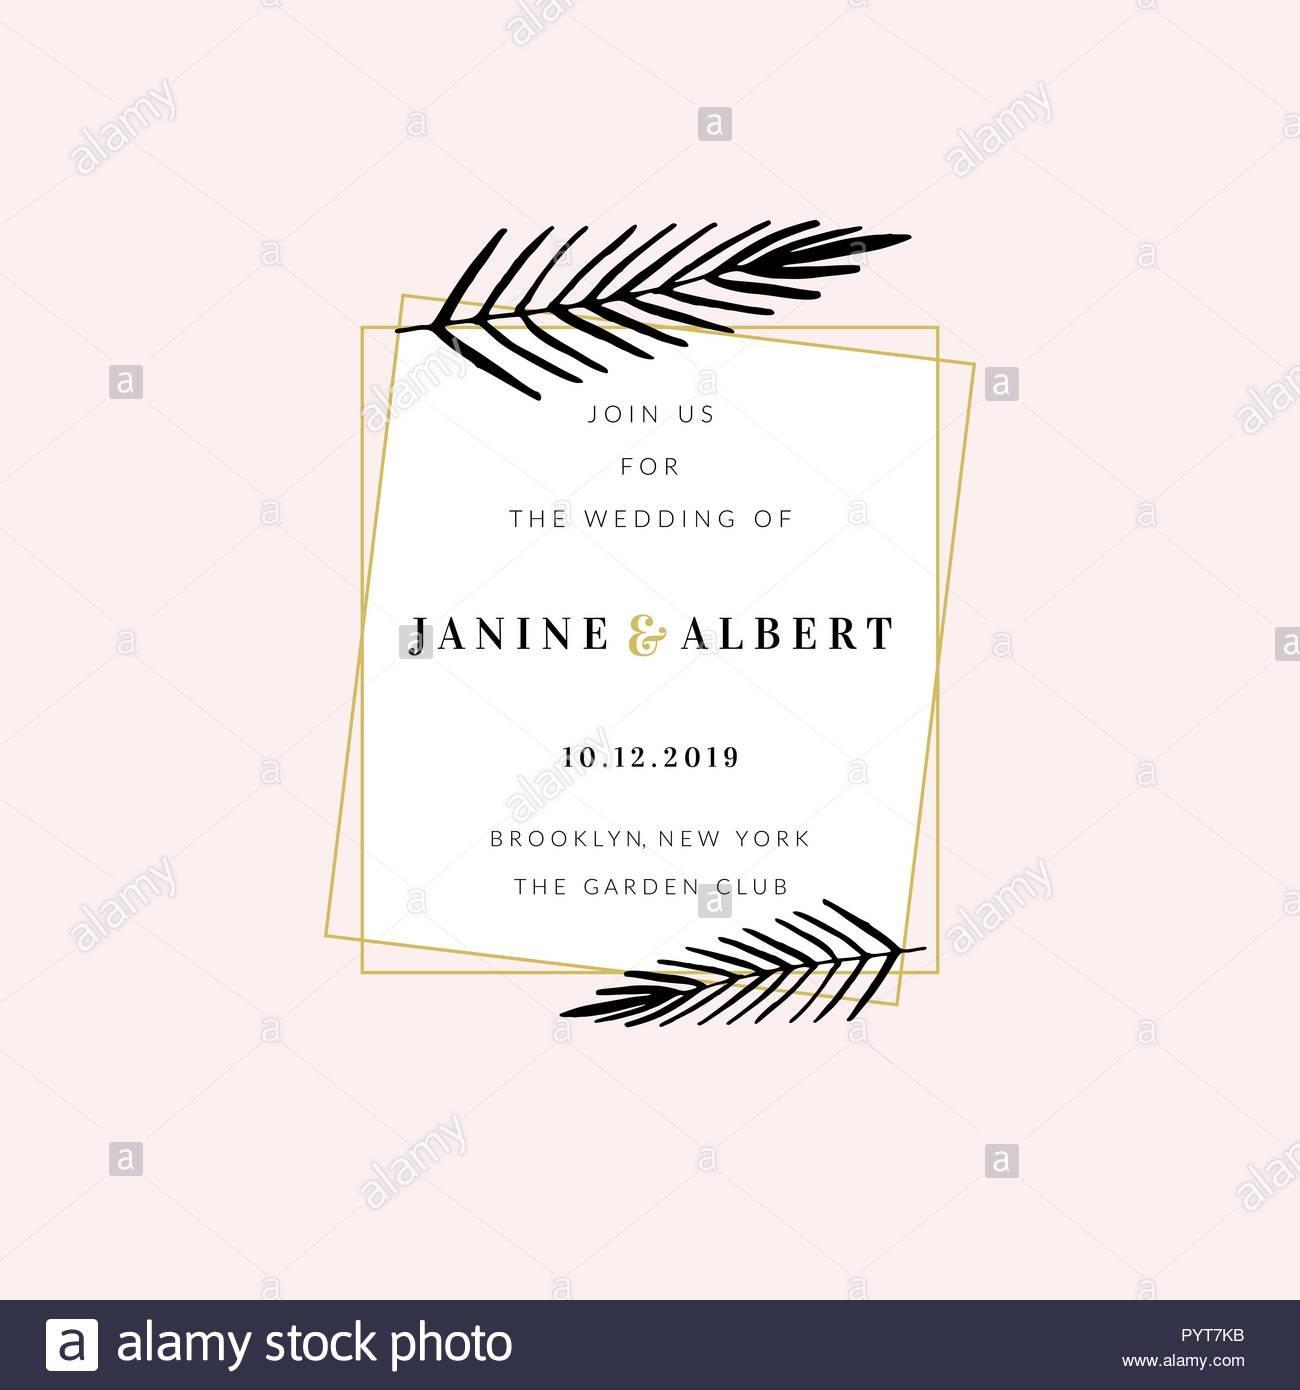 Golden Wedding Invitation Sample